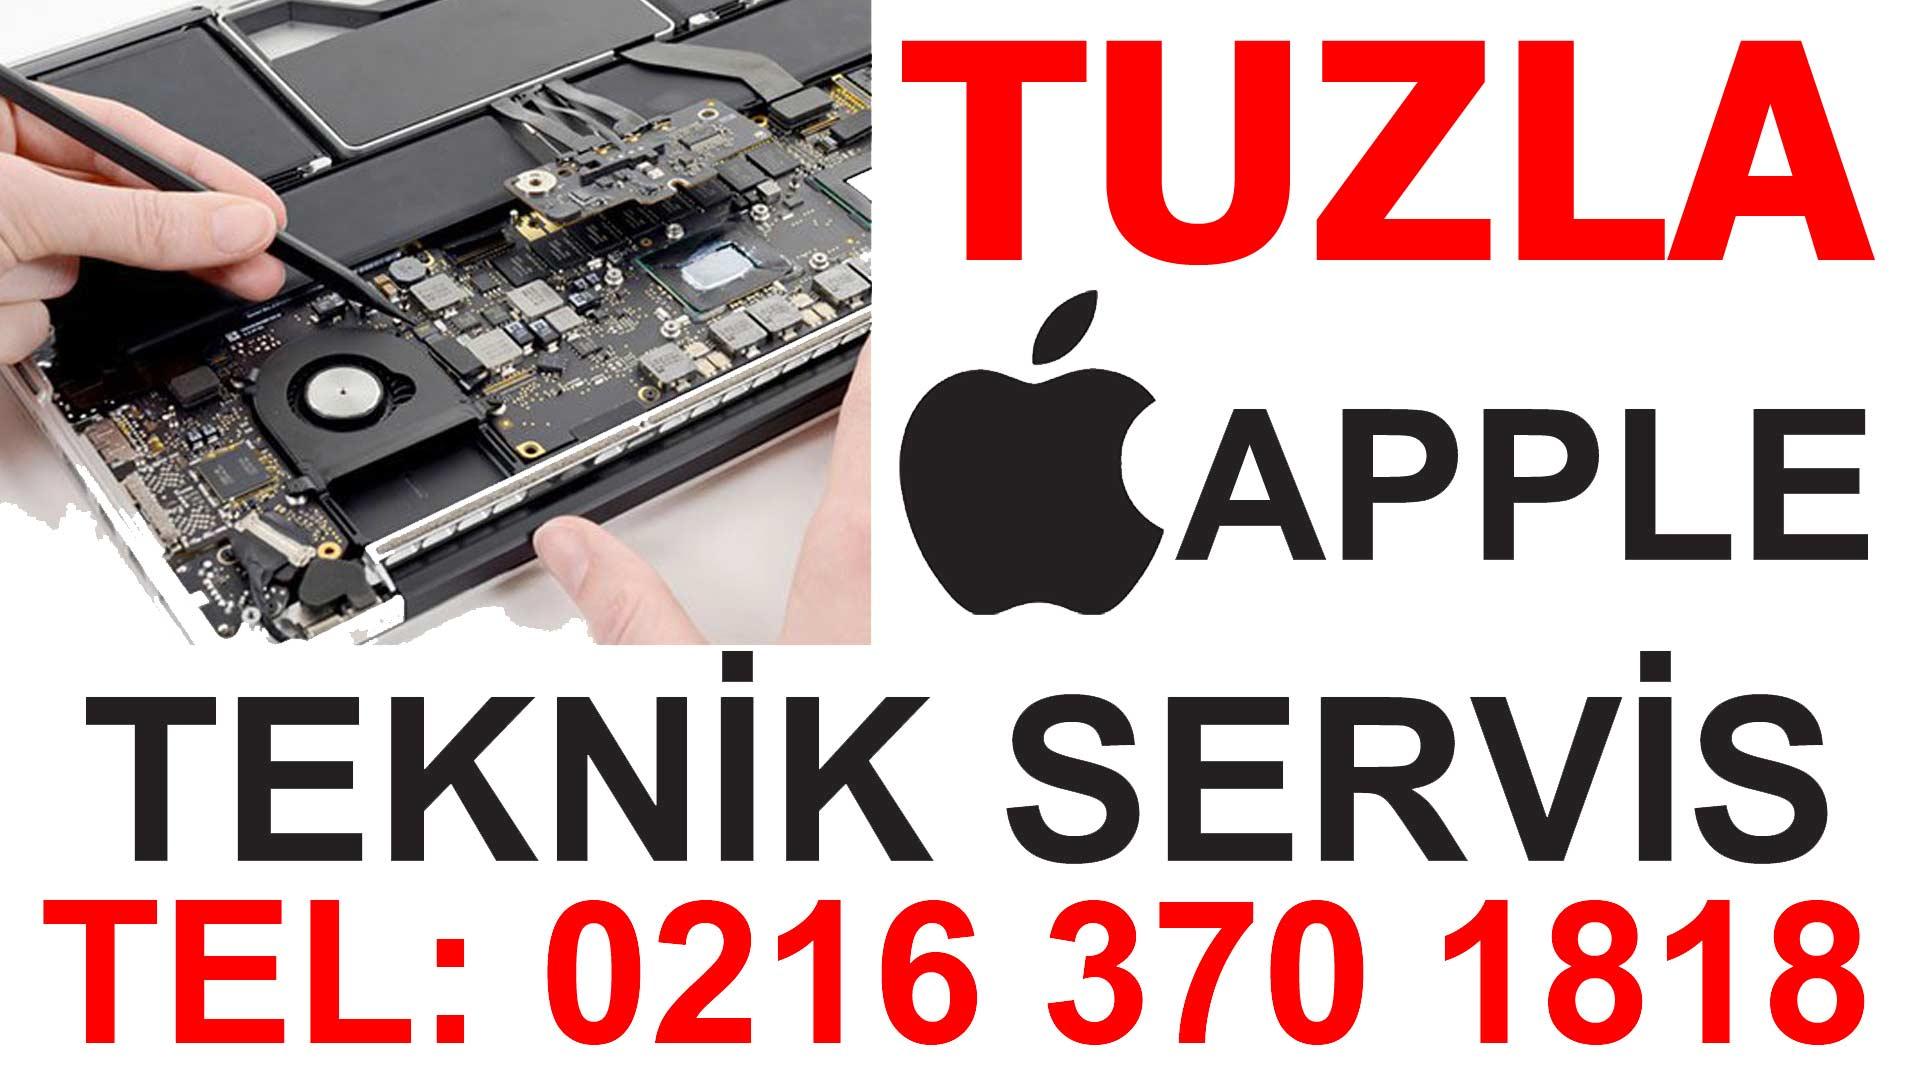 tuzla apple teknik servis